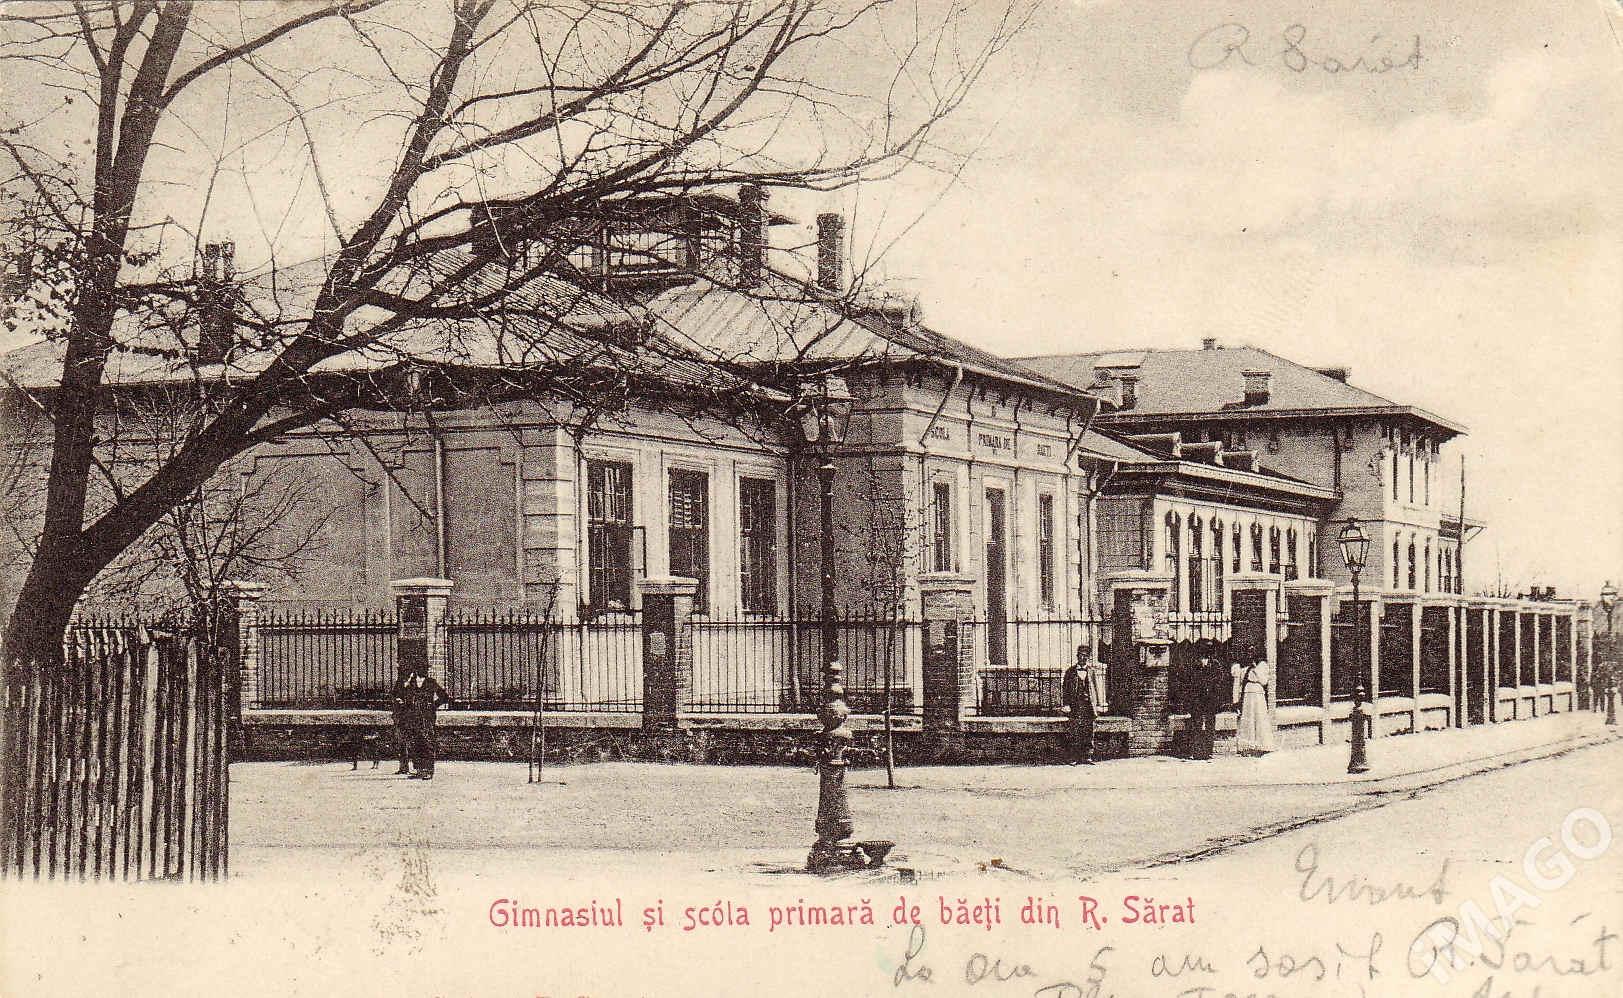 ramnicu-sarat-gimnaziul-si-scoala-primara-de-baieti-91